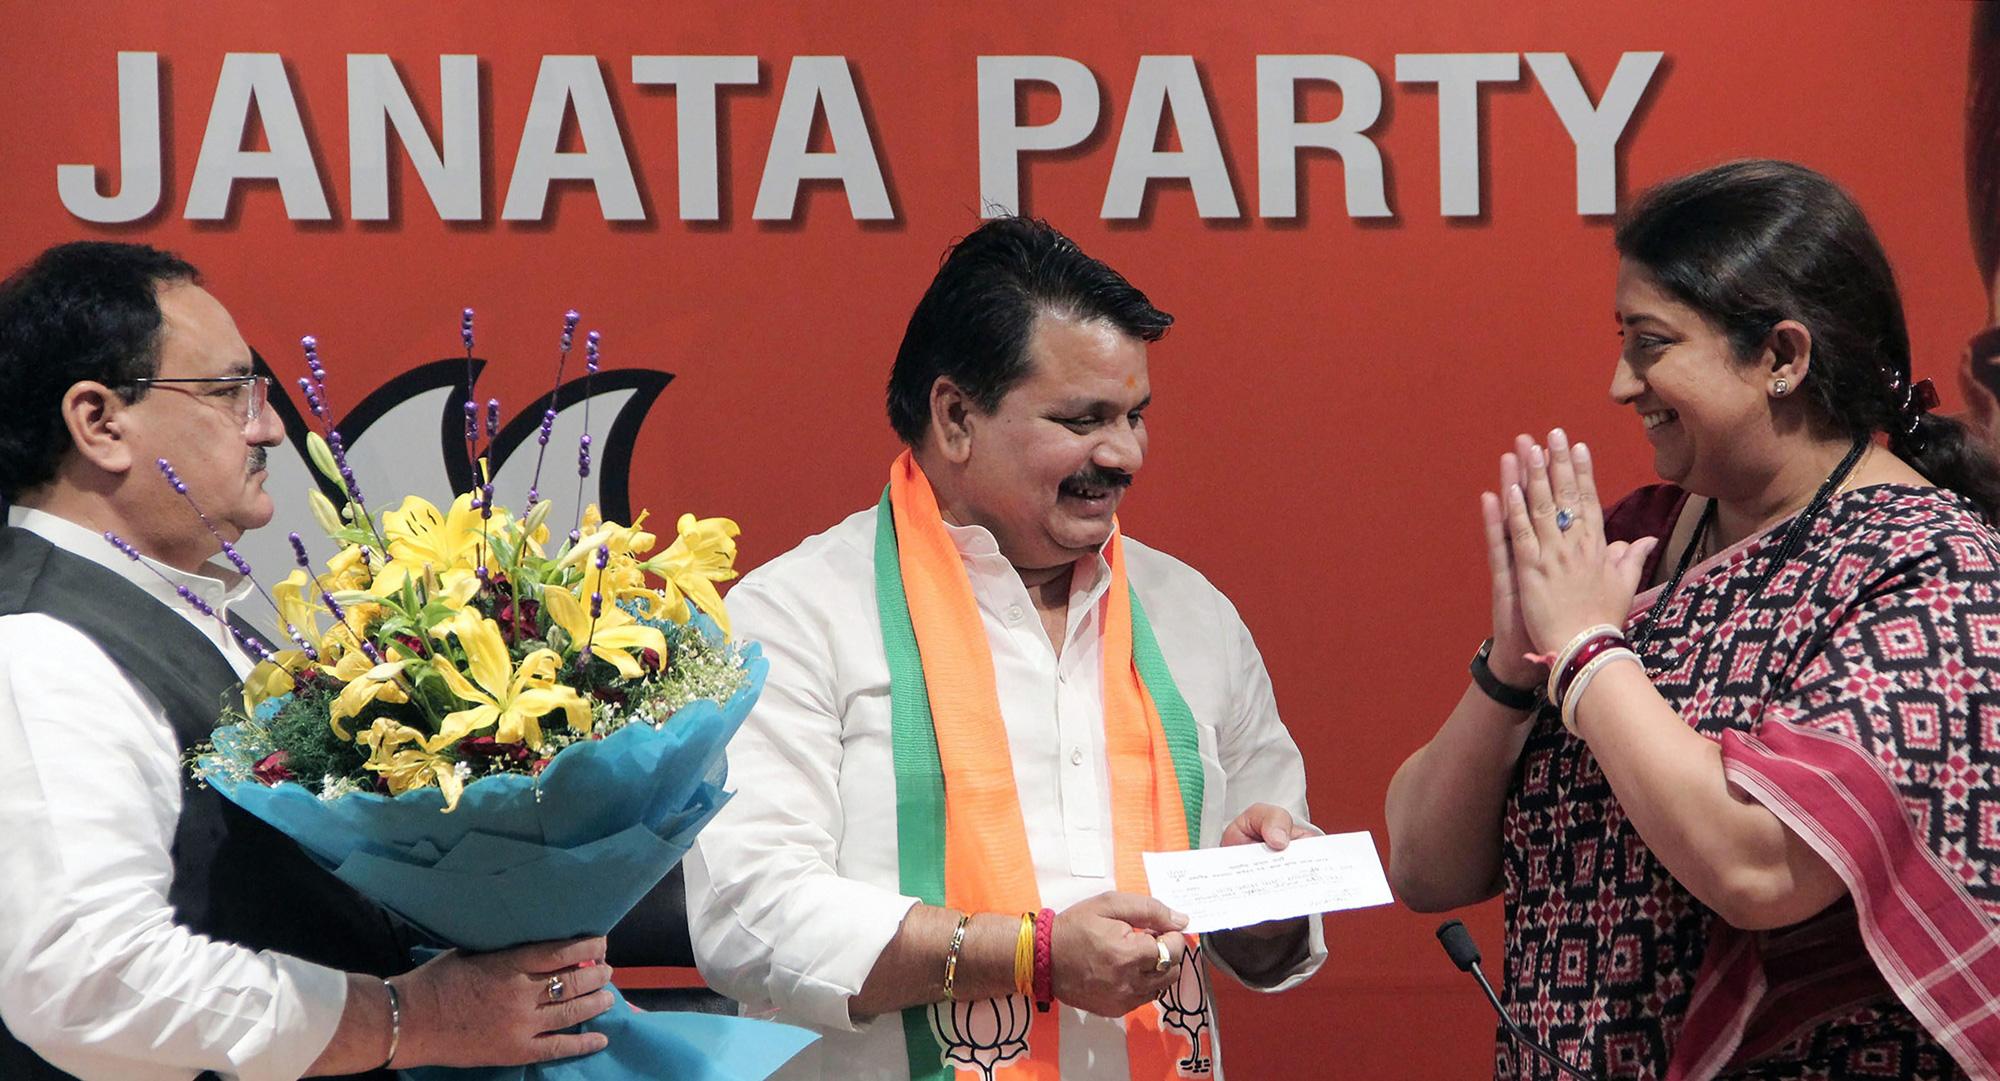 BSP leader Chandra Prakash Mishra joins Bharatiya Janata Party in the presence of senior party leaders Smriti Irani and Jagat Prakash Nadda at Party Headquaters, in New Delhi on Wednesday, March 20, 2019.